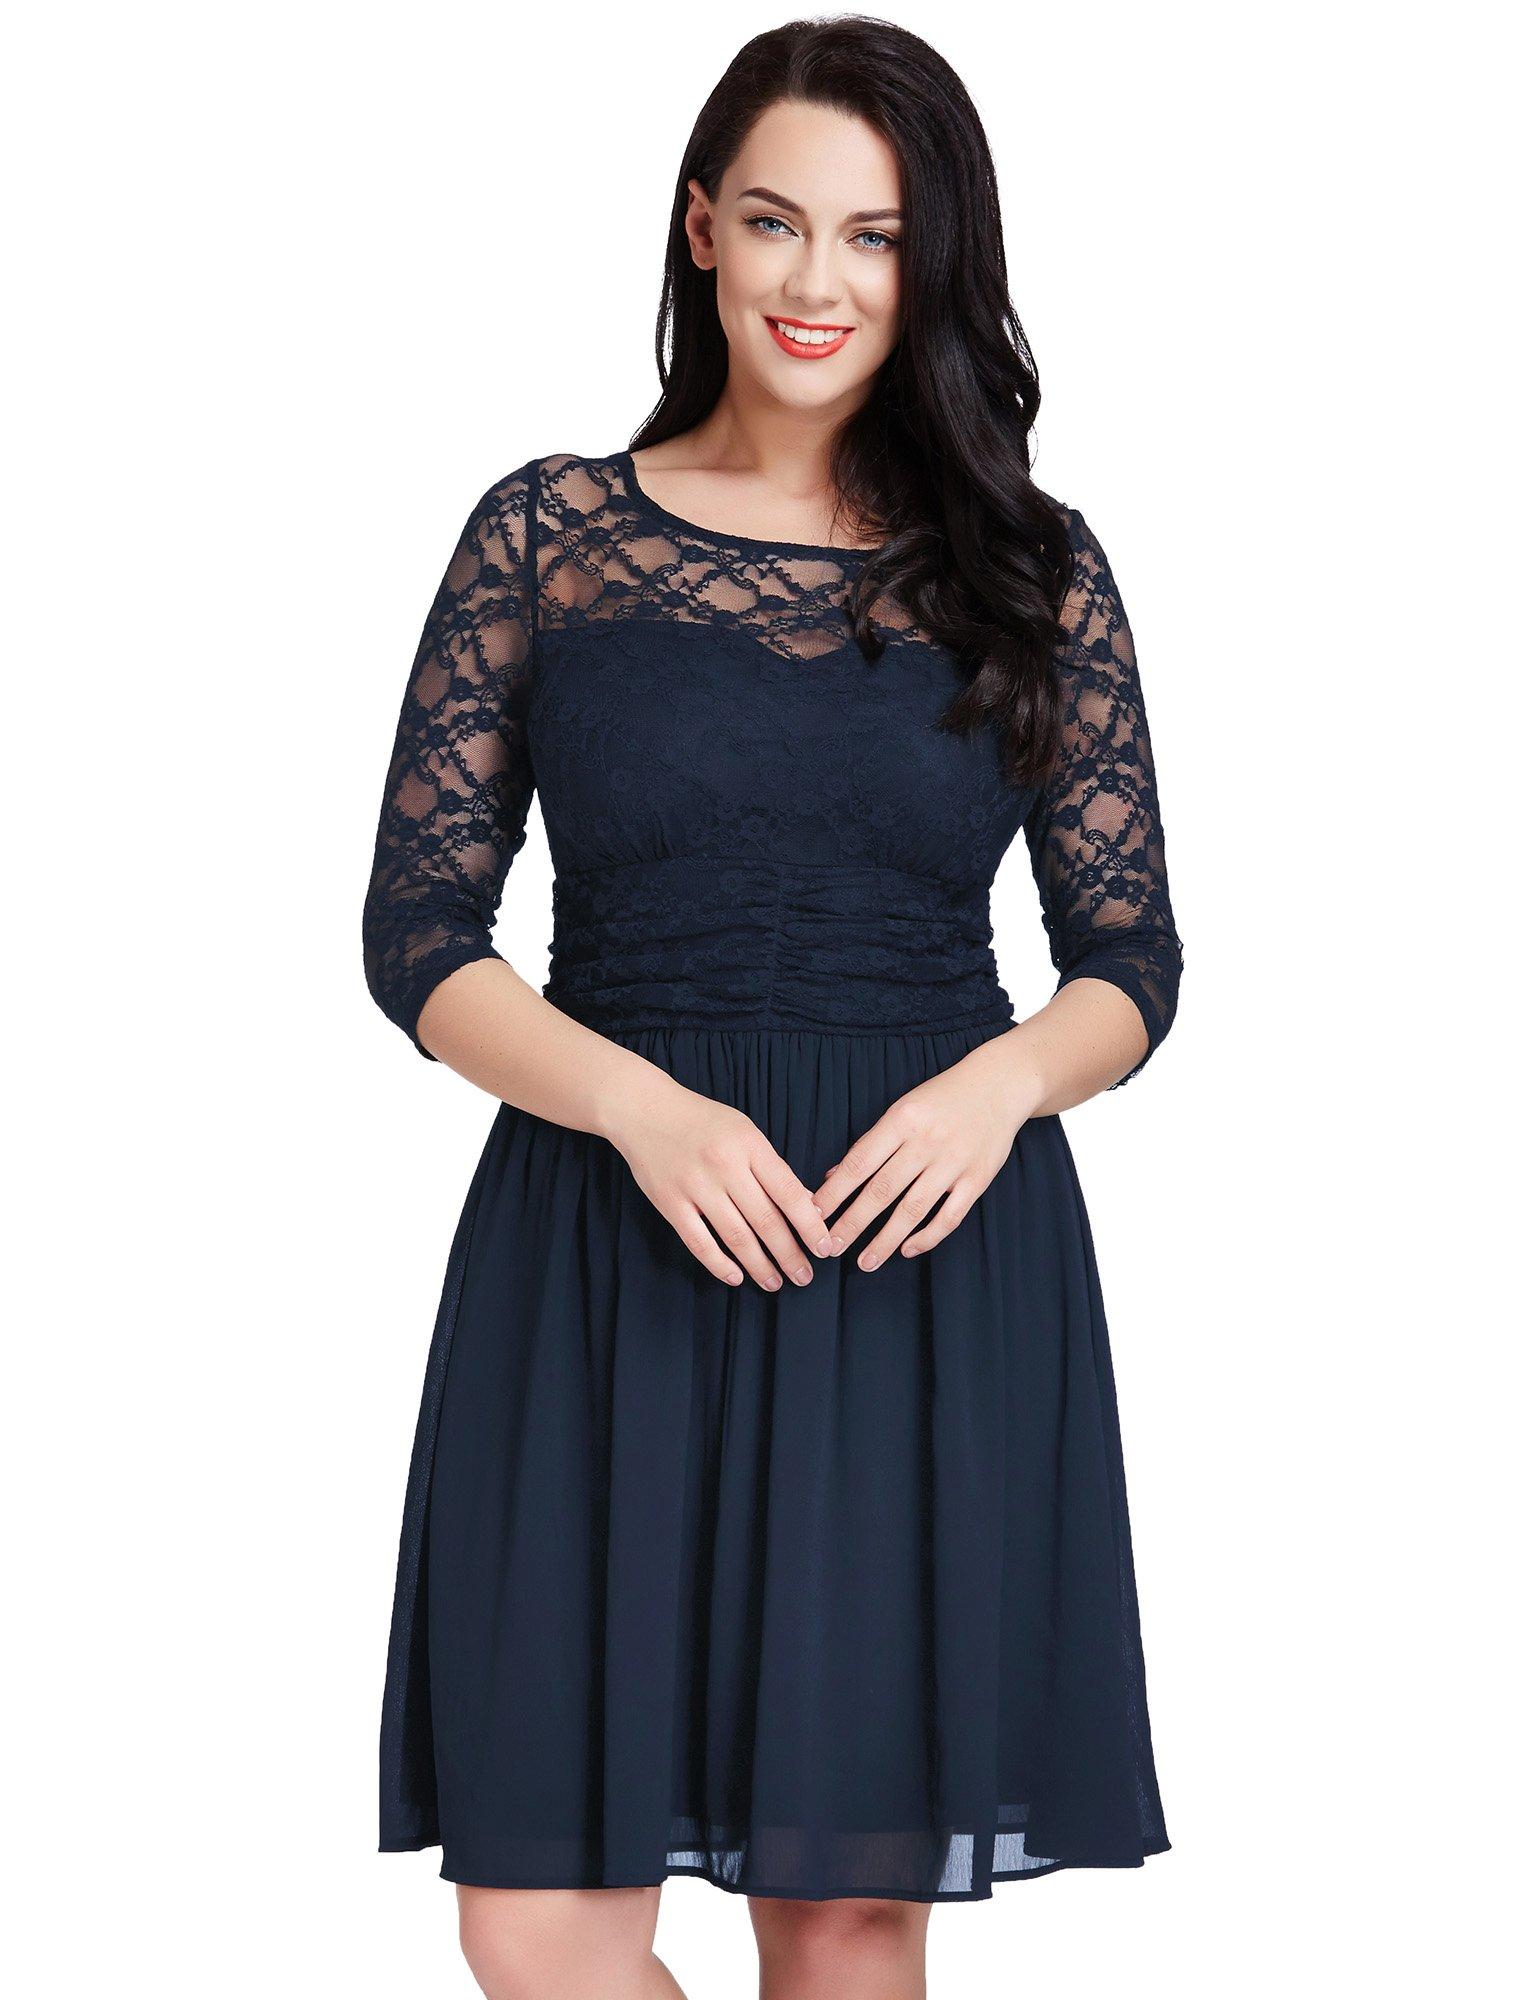 Plus Size Special Occasion Dresses: Amazon.com